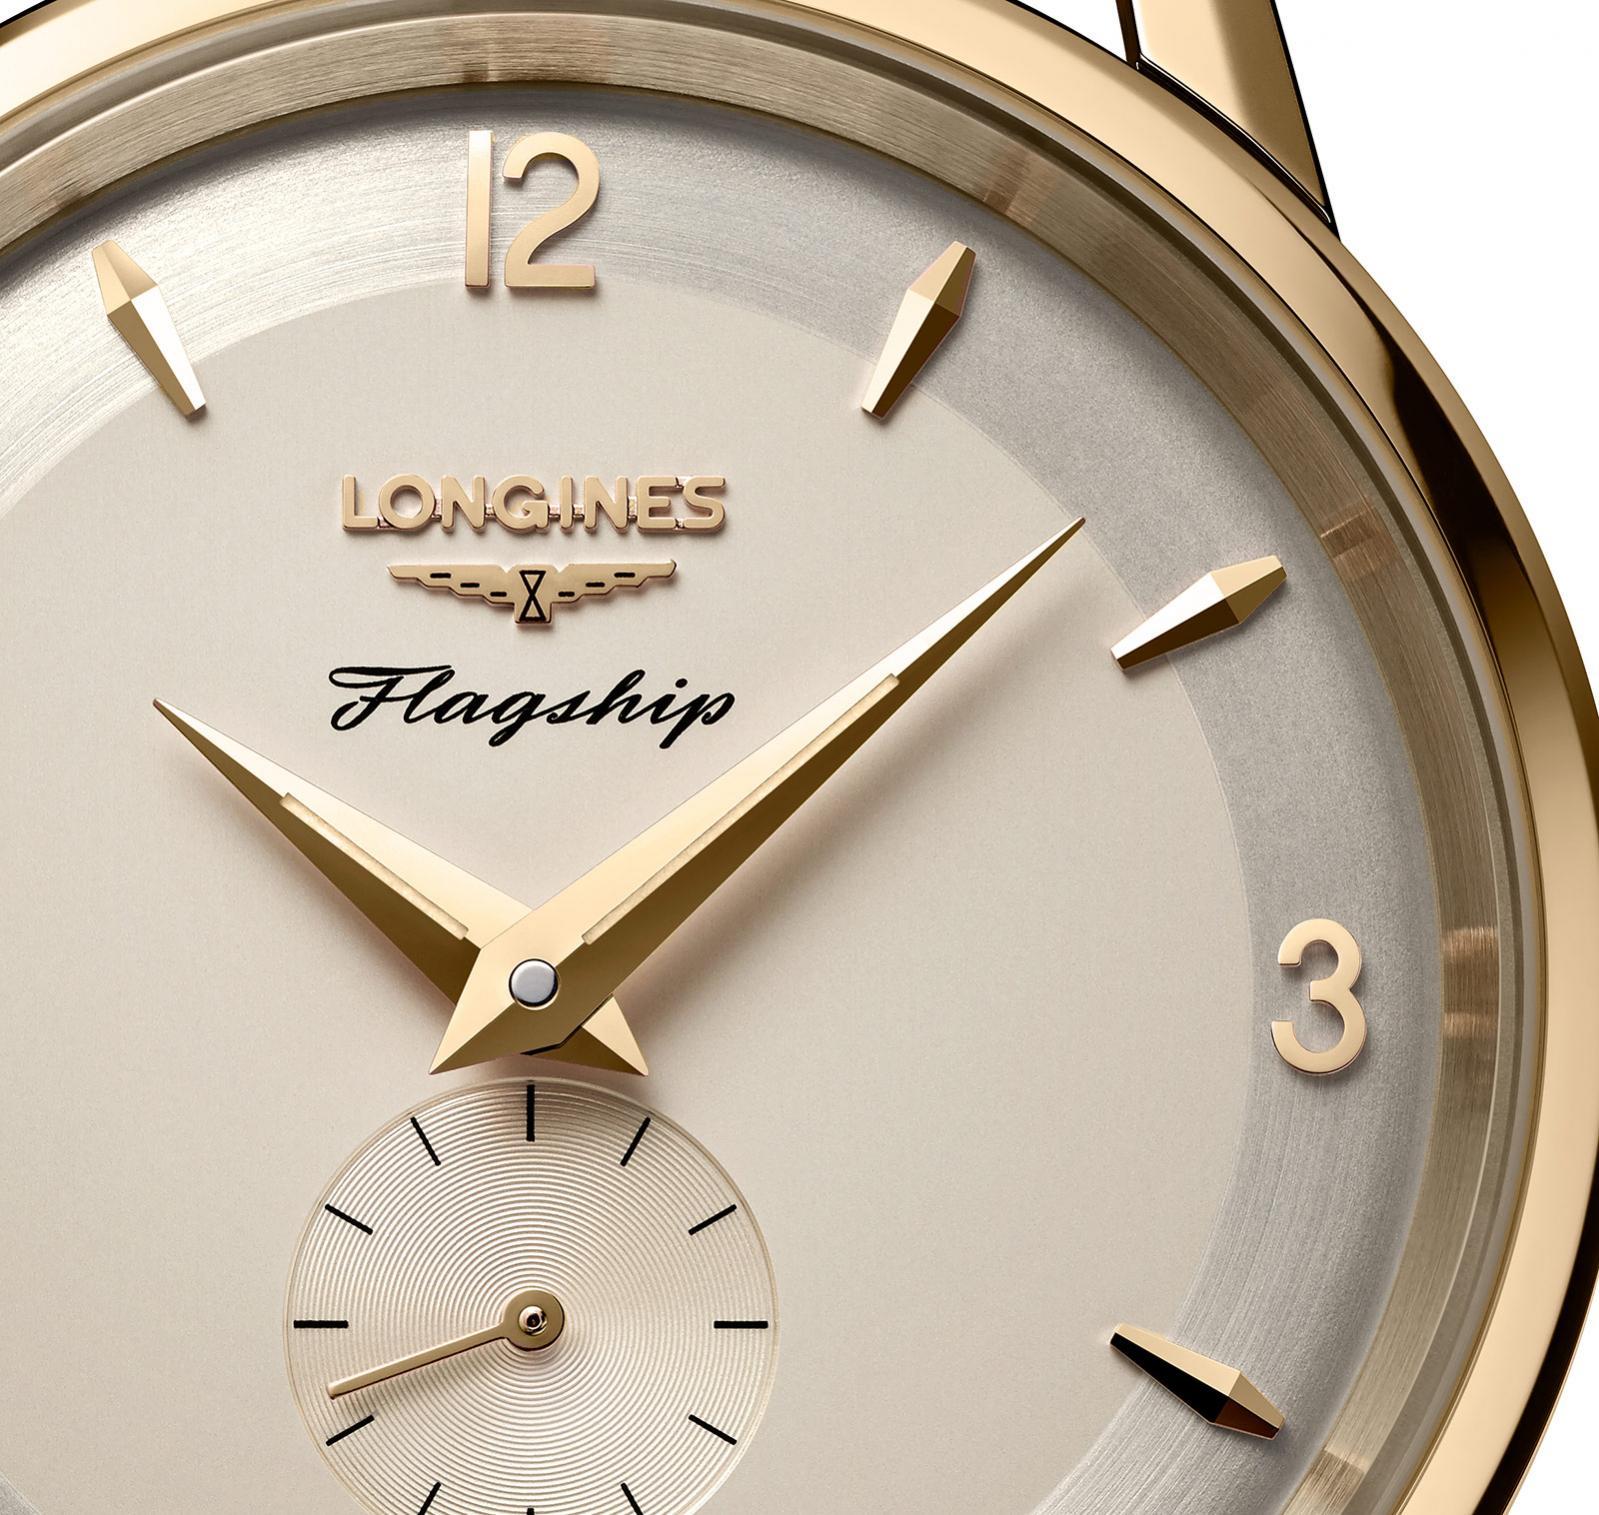 Naziv: Longines-Flagship-Heritage-60th-Anniversary-yellow-gold.jpg, pregleda: 215, veličina: 282,3 KB